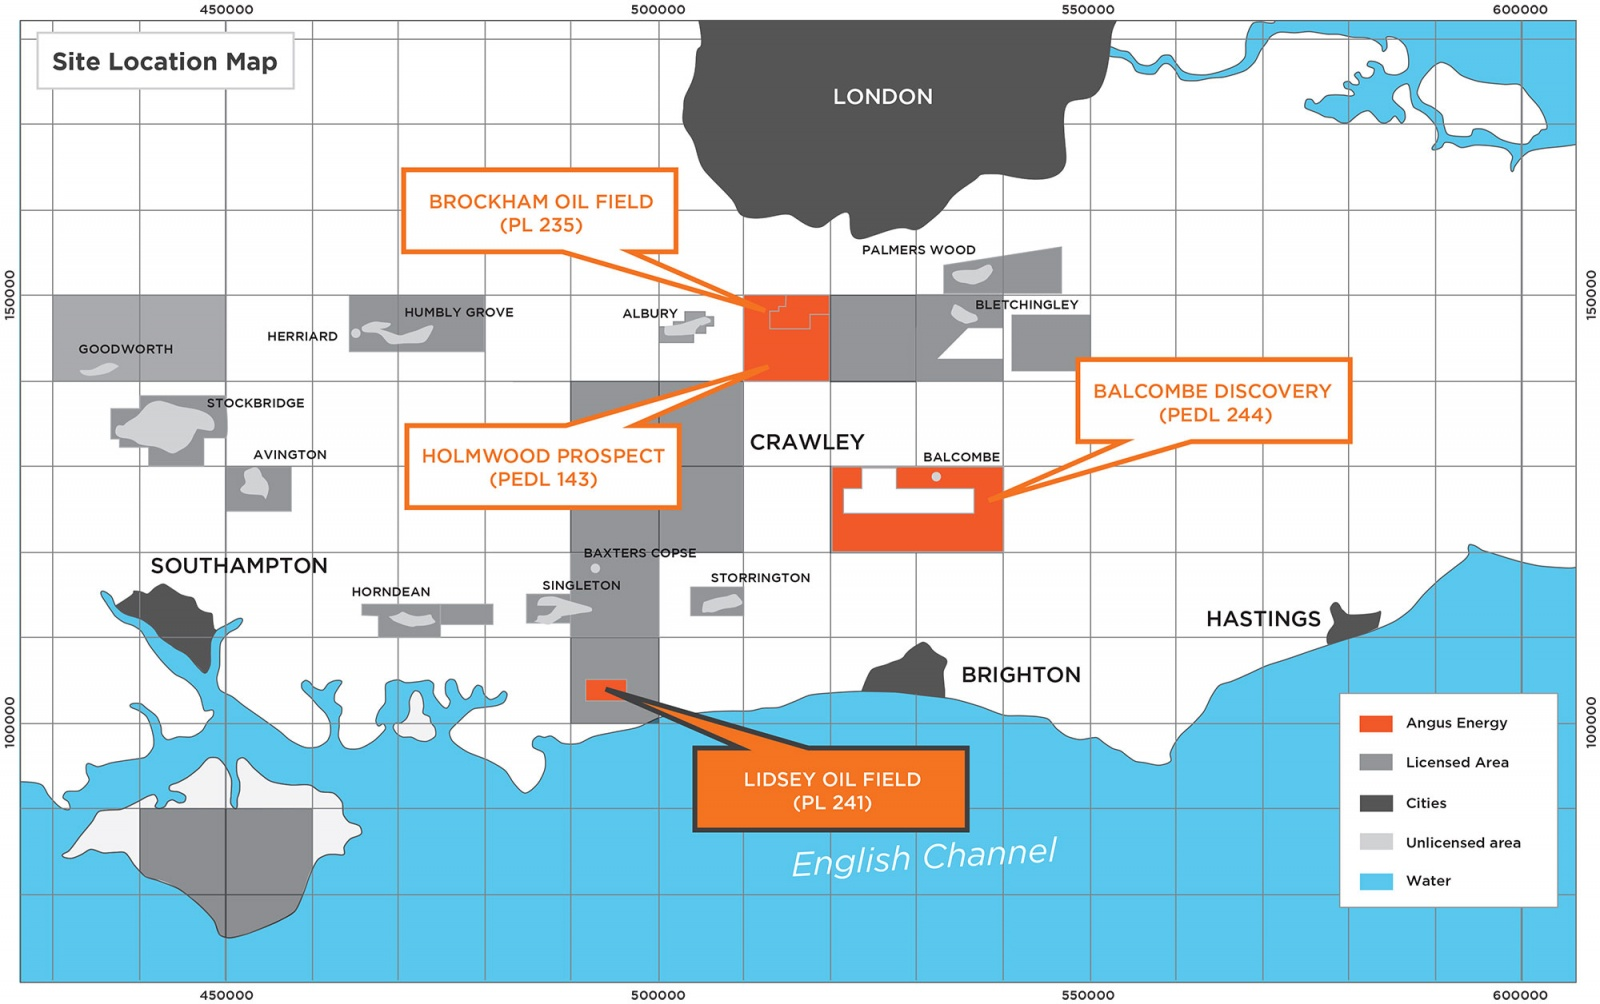 Map Of Uk Oil Fields.Lidsey Oil Field Angus Energy Plc